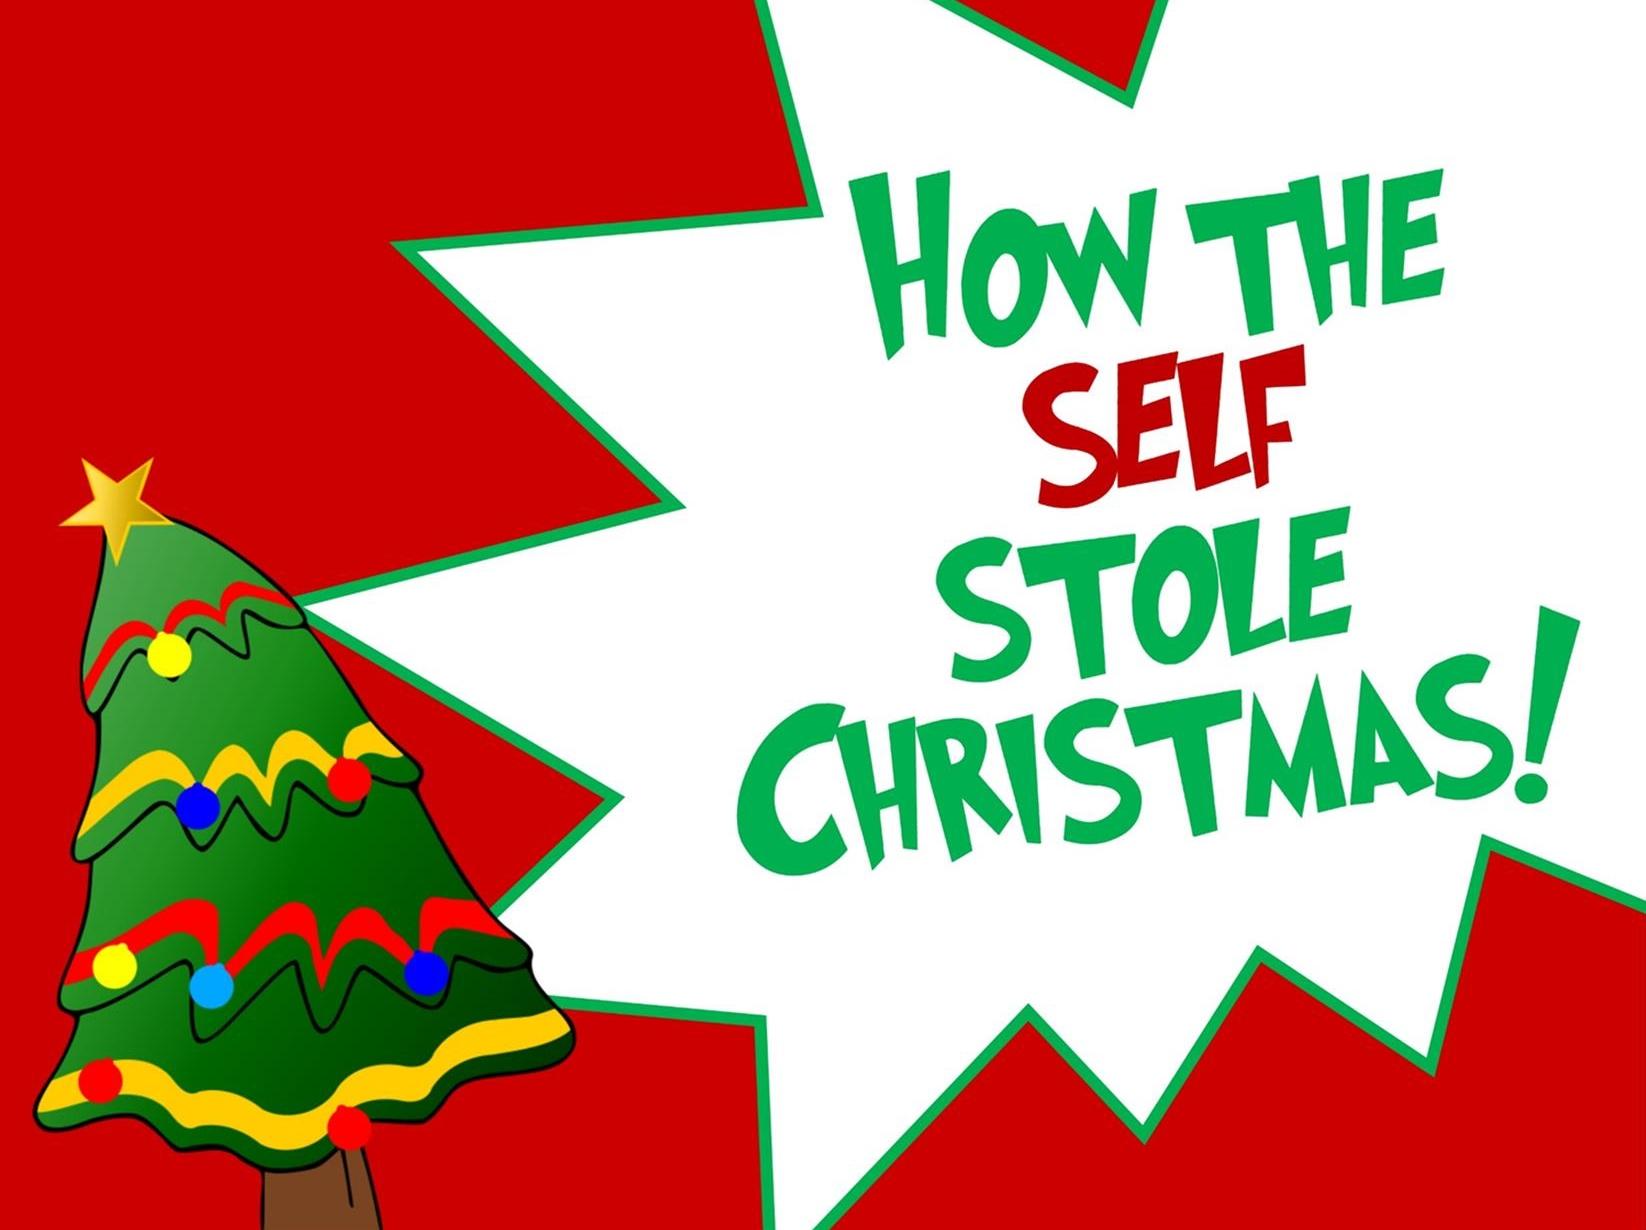 December 4, 2016 ~ How the Self Stole Christmas (Philippians 2:1-11) ~ Pastor Jason Pilchard